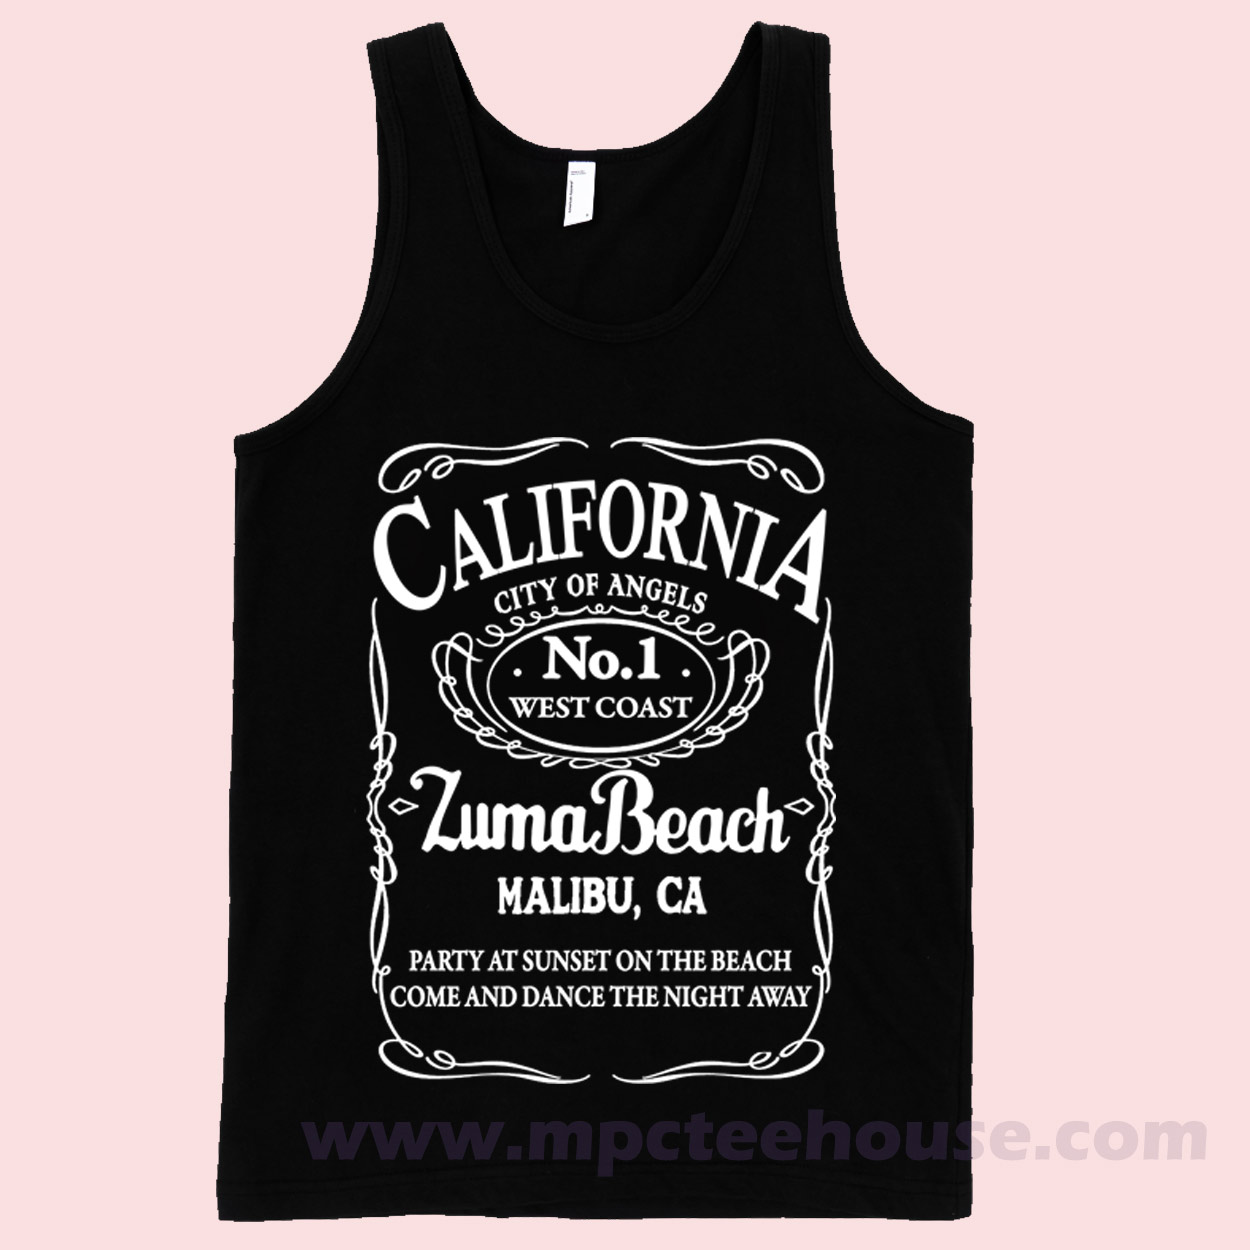 California Malibu Zuma Beach Black Tank Top